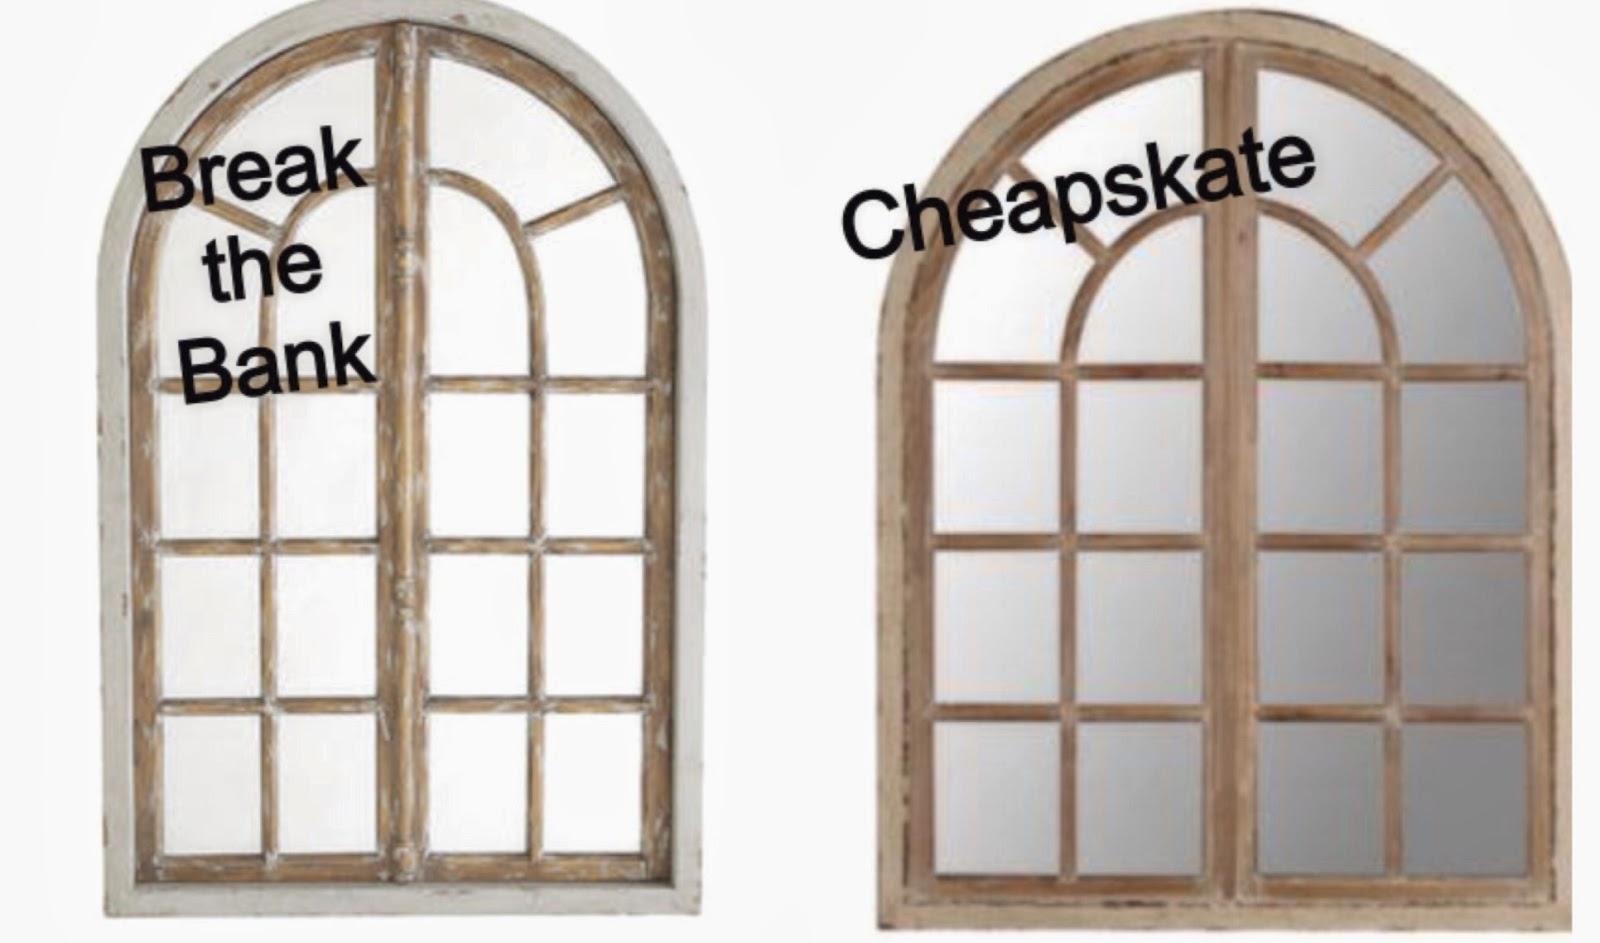 whimsy girl: Break the Bank vs. Cheapskate {Arch Window ...